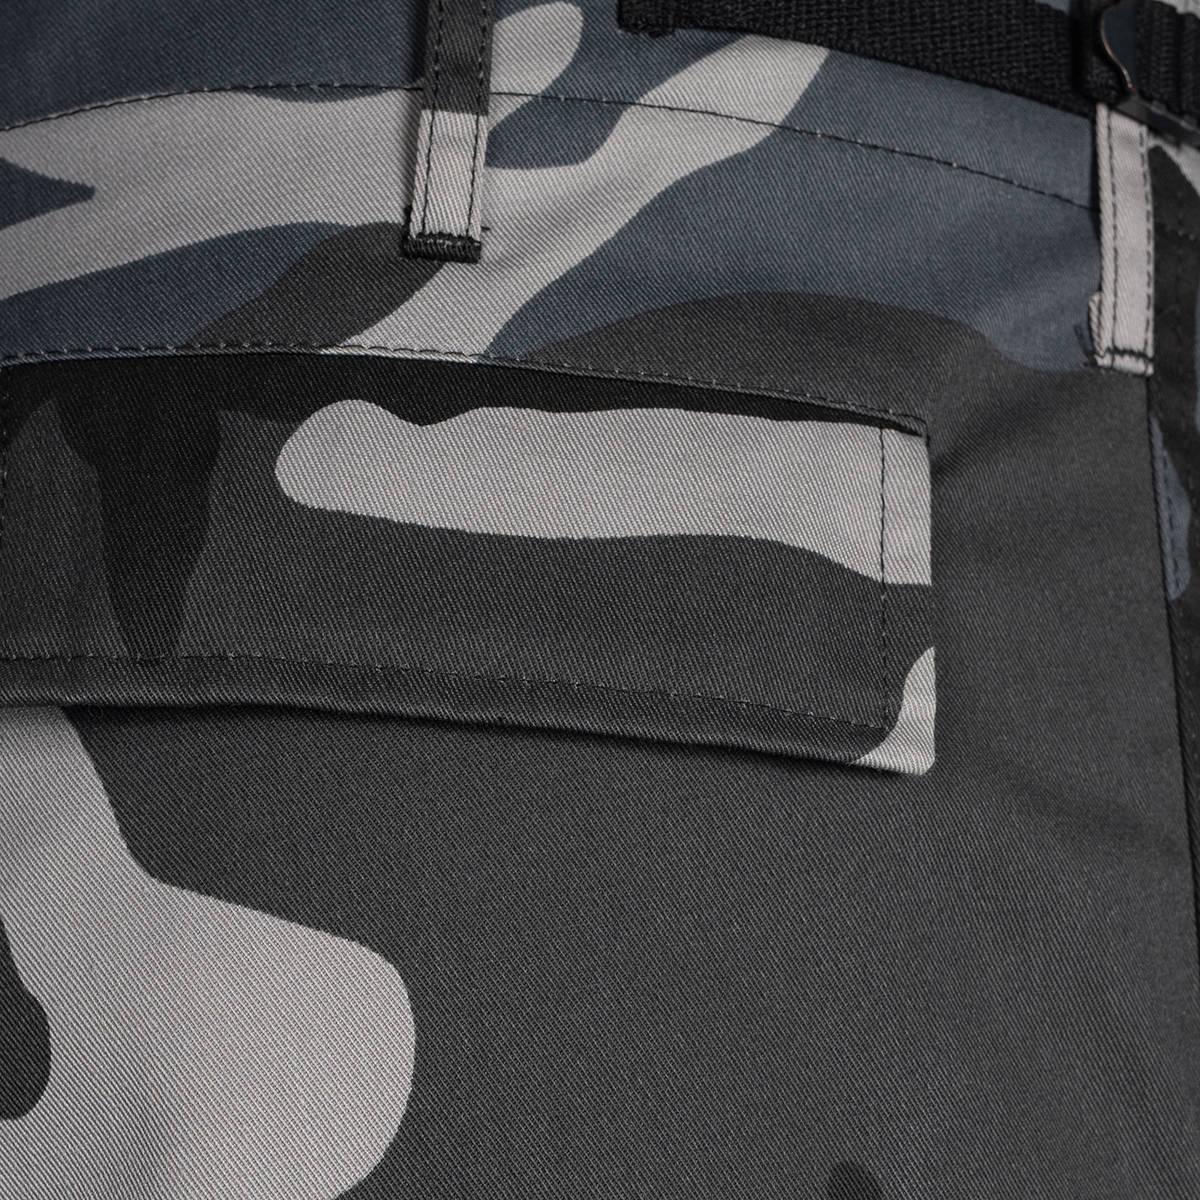 2af9089eb0d3 Amerikai BDU stílusú vadőr terep nadrág, Dark Camo Dark Camo ...